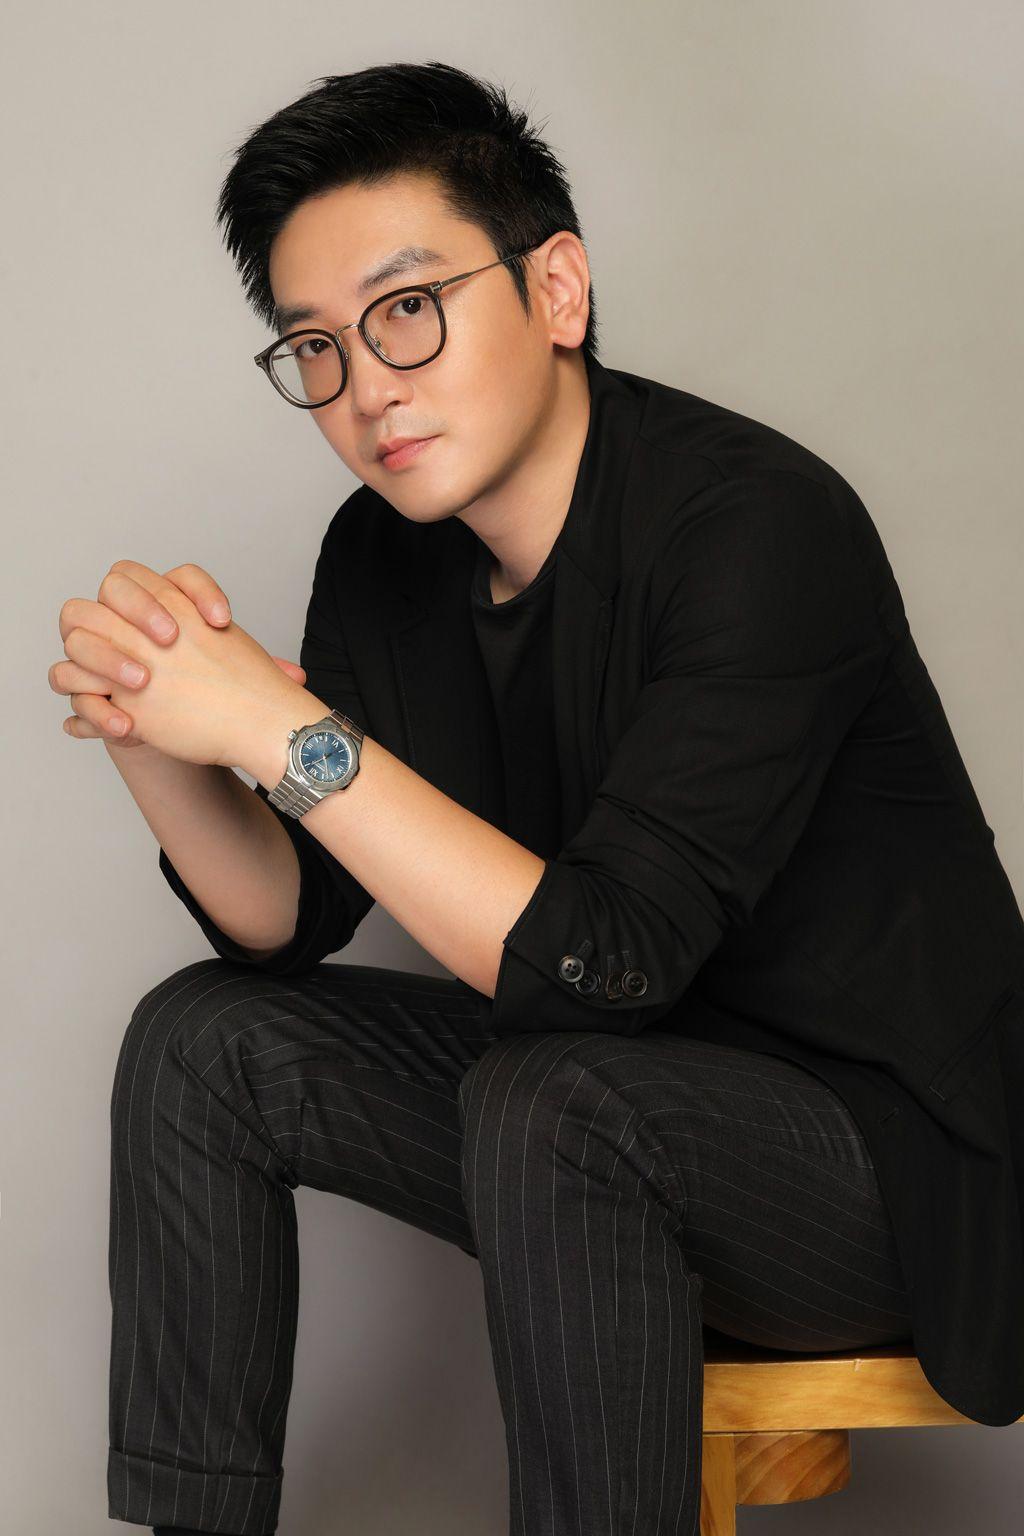 Chen Kan